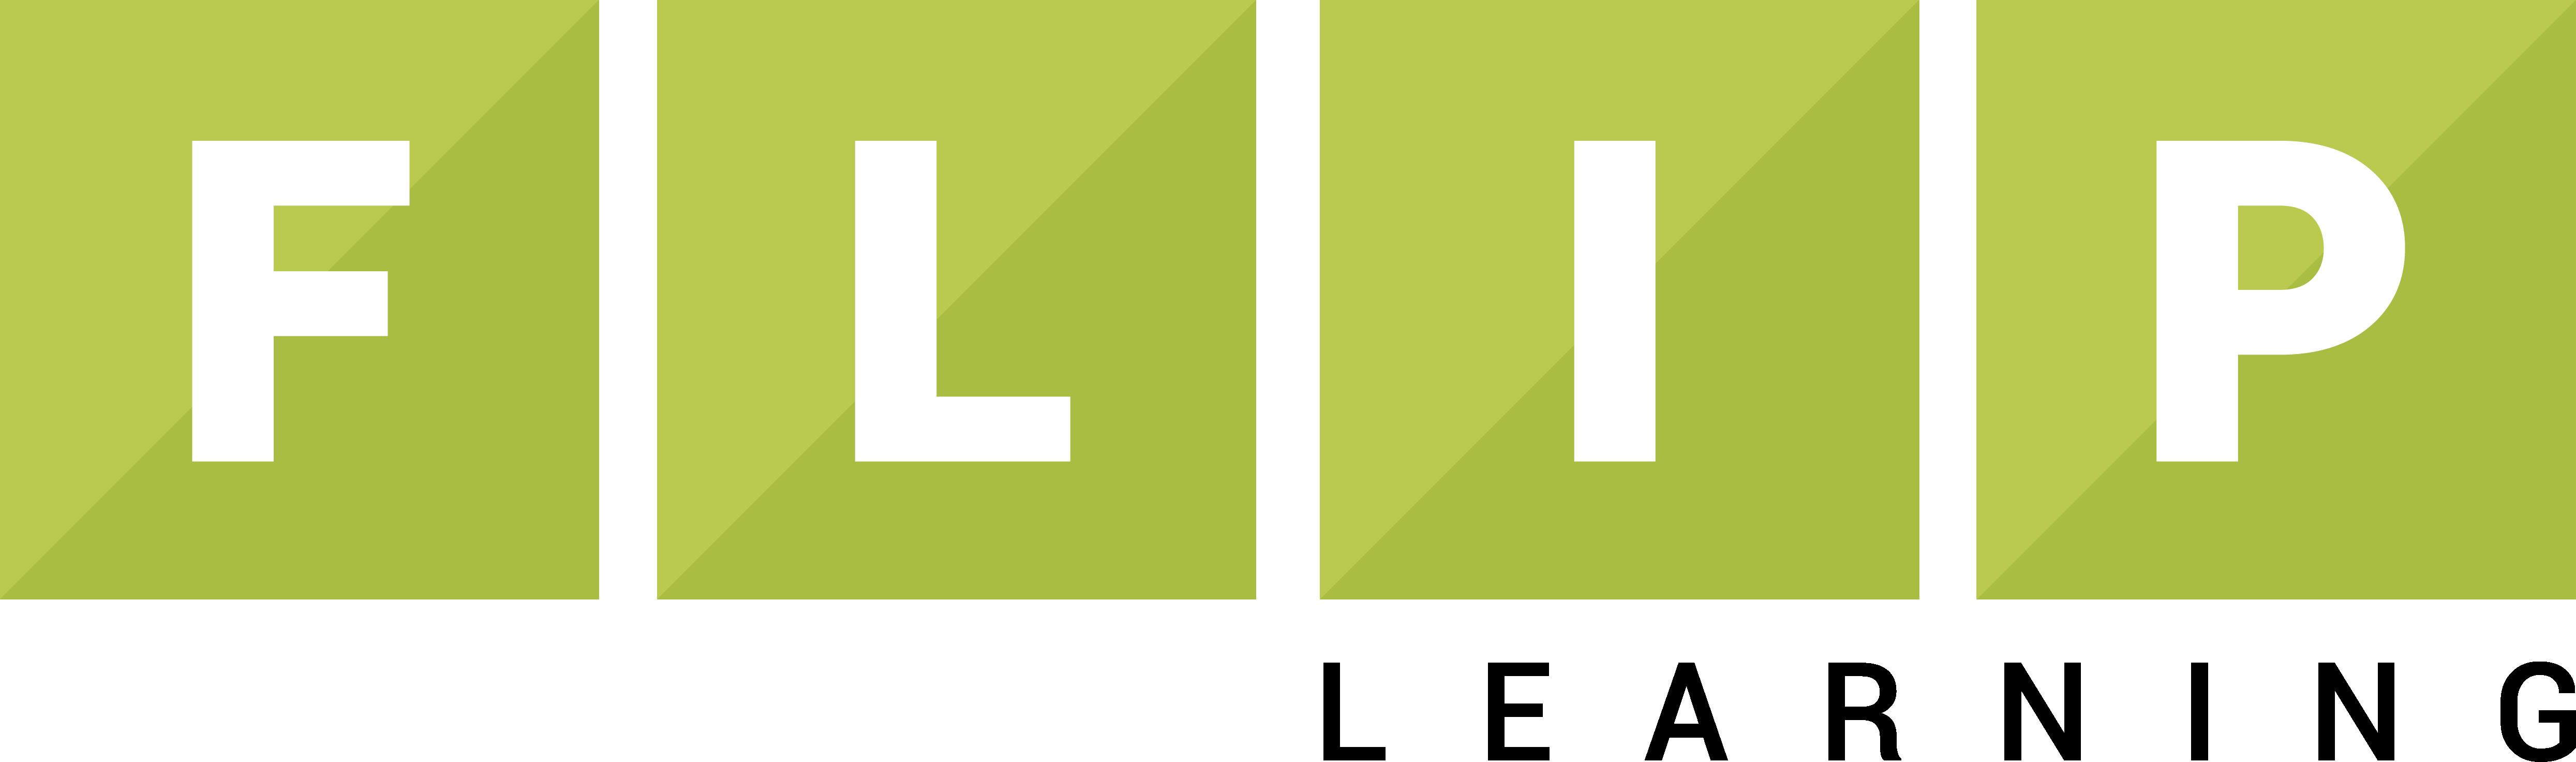 Flipped Learning Logo